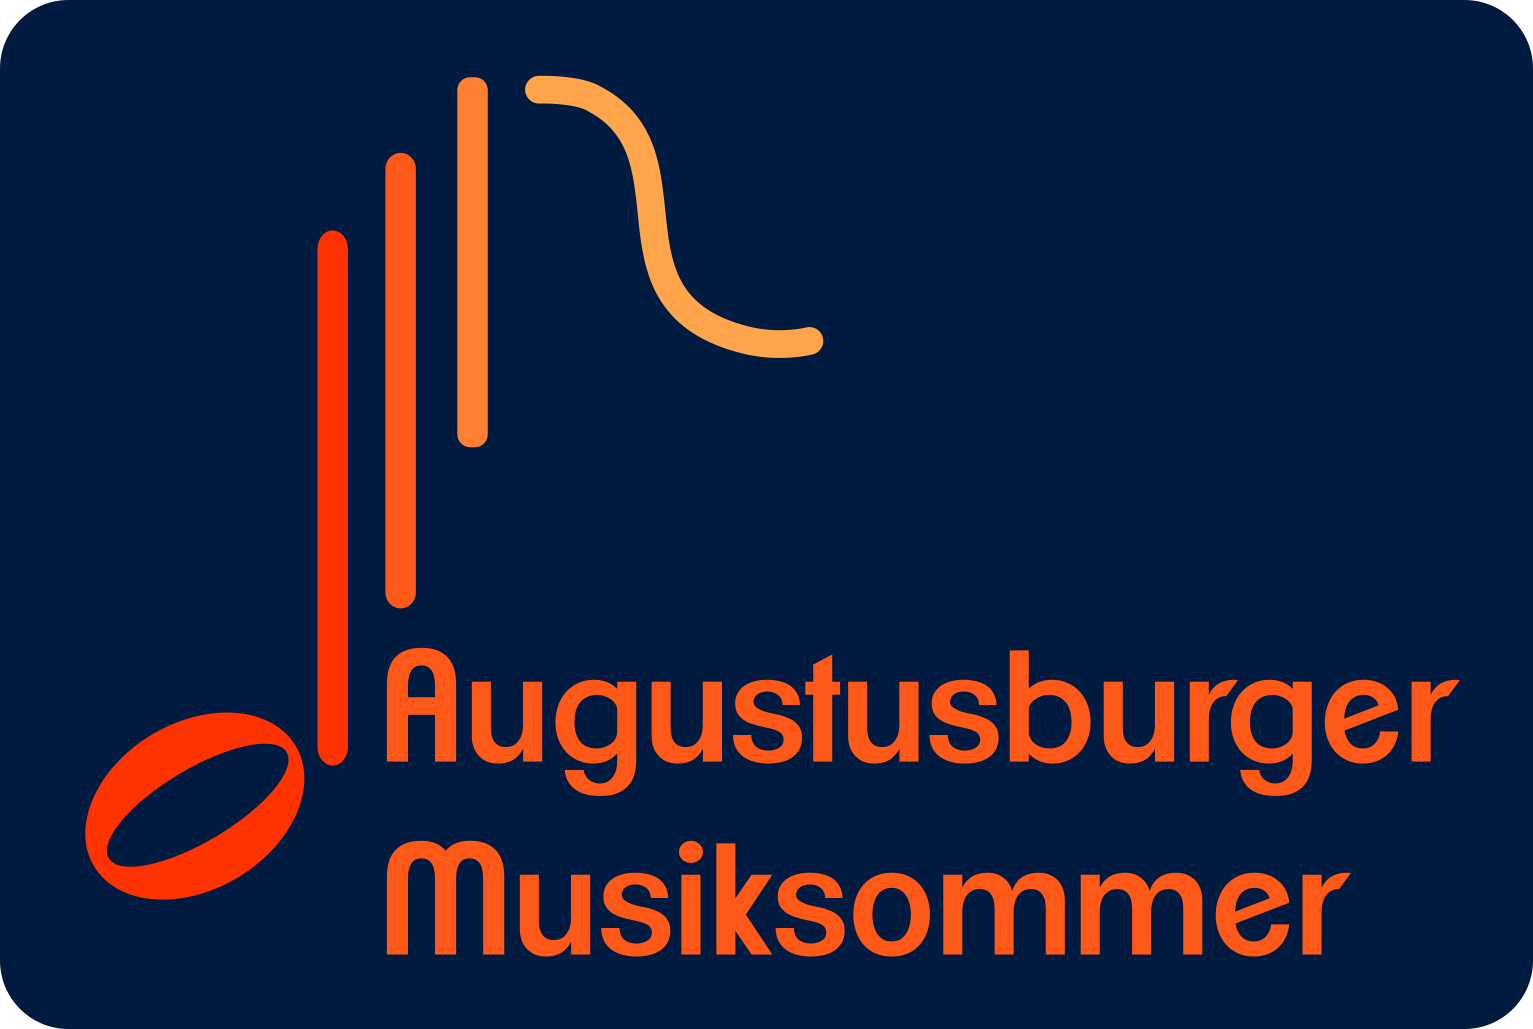 Augustusburger Musiksommer